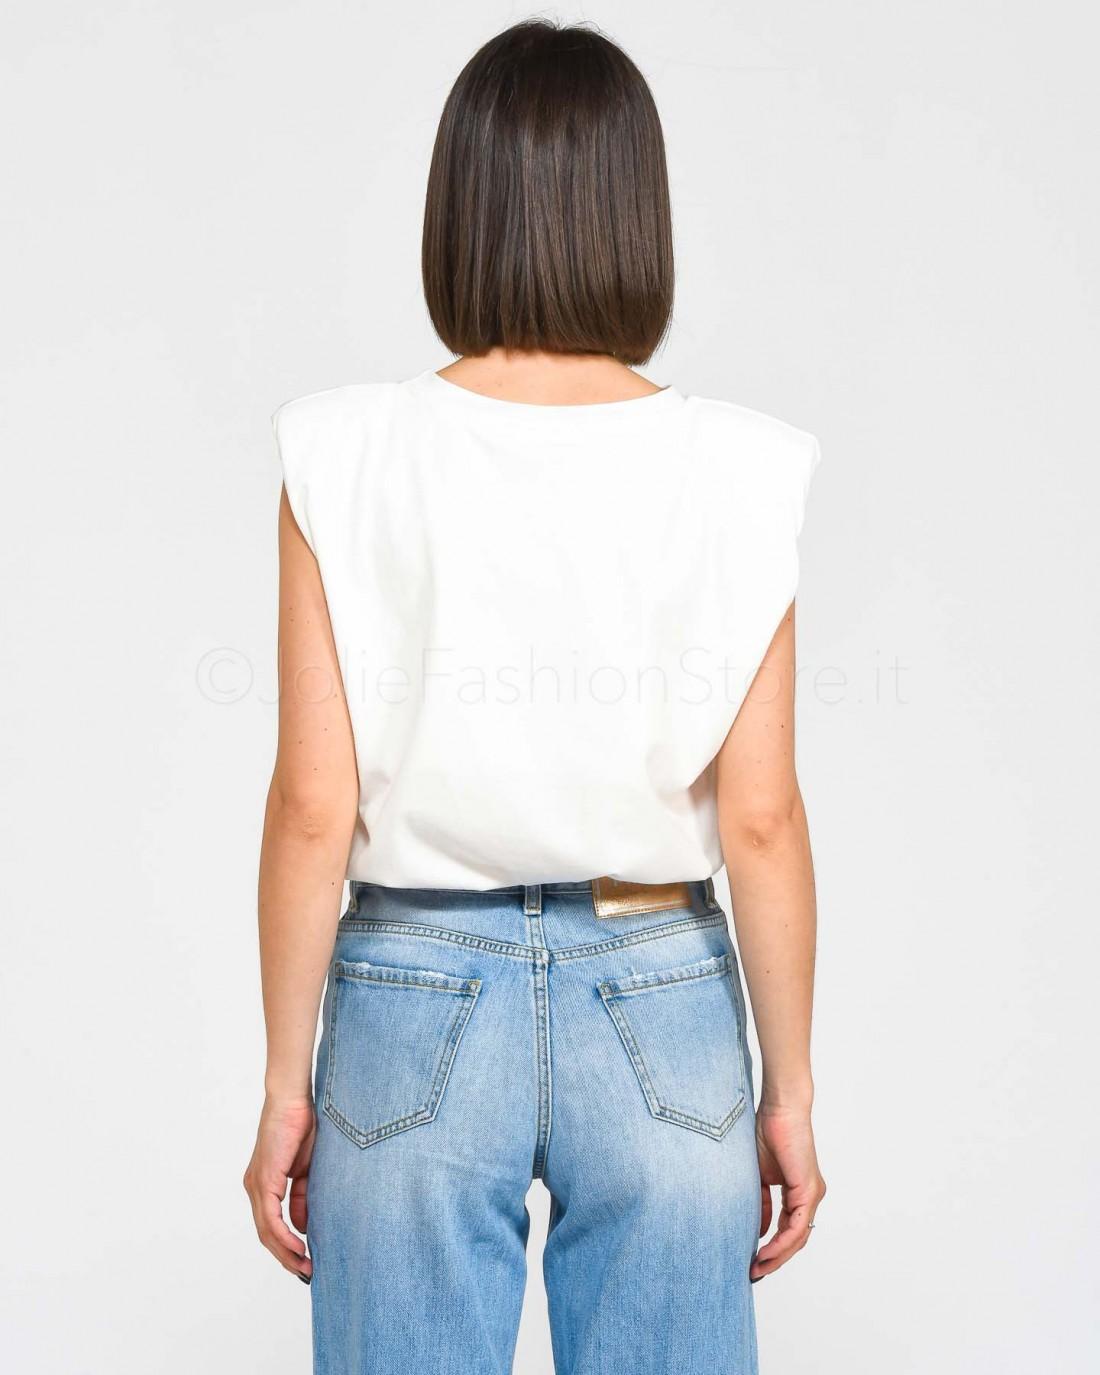 online store f08c4 cee91 Patrizia Pepe Jeans Basic Nero - A/I 2019/20